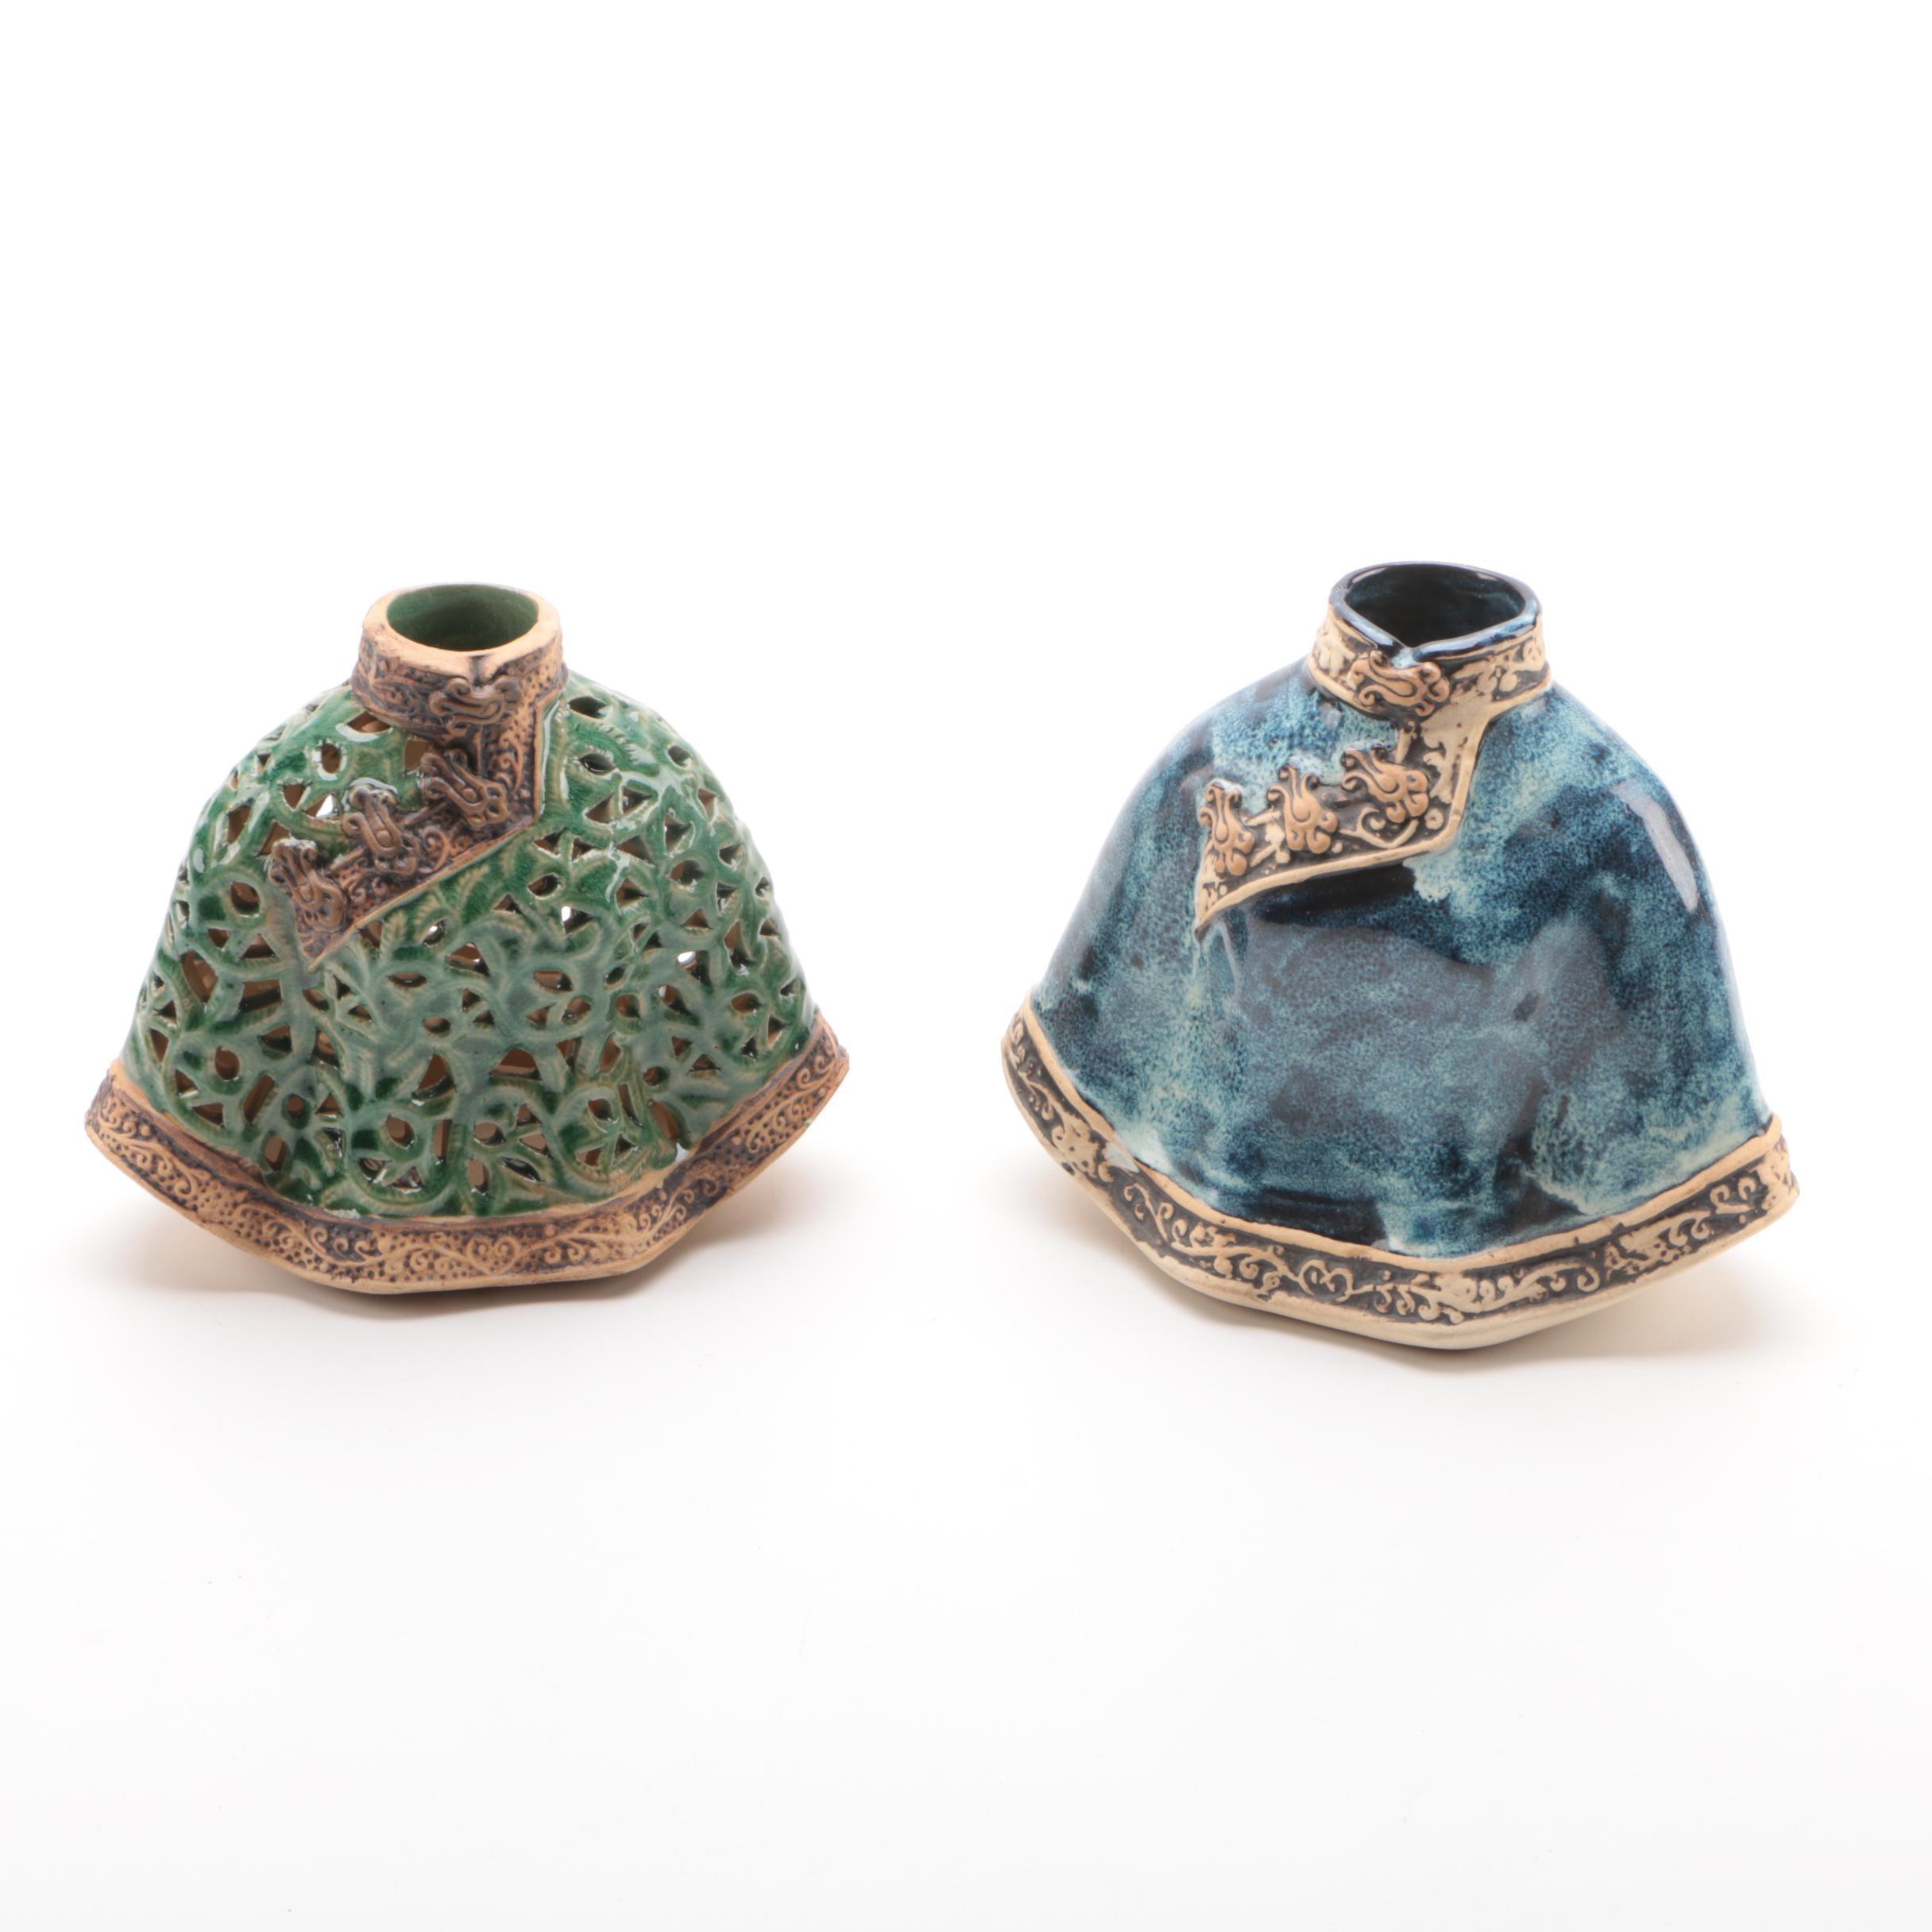 Pair of Cape Shaped Stoneware Vases